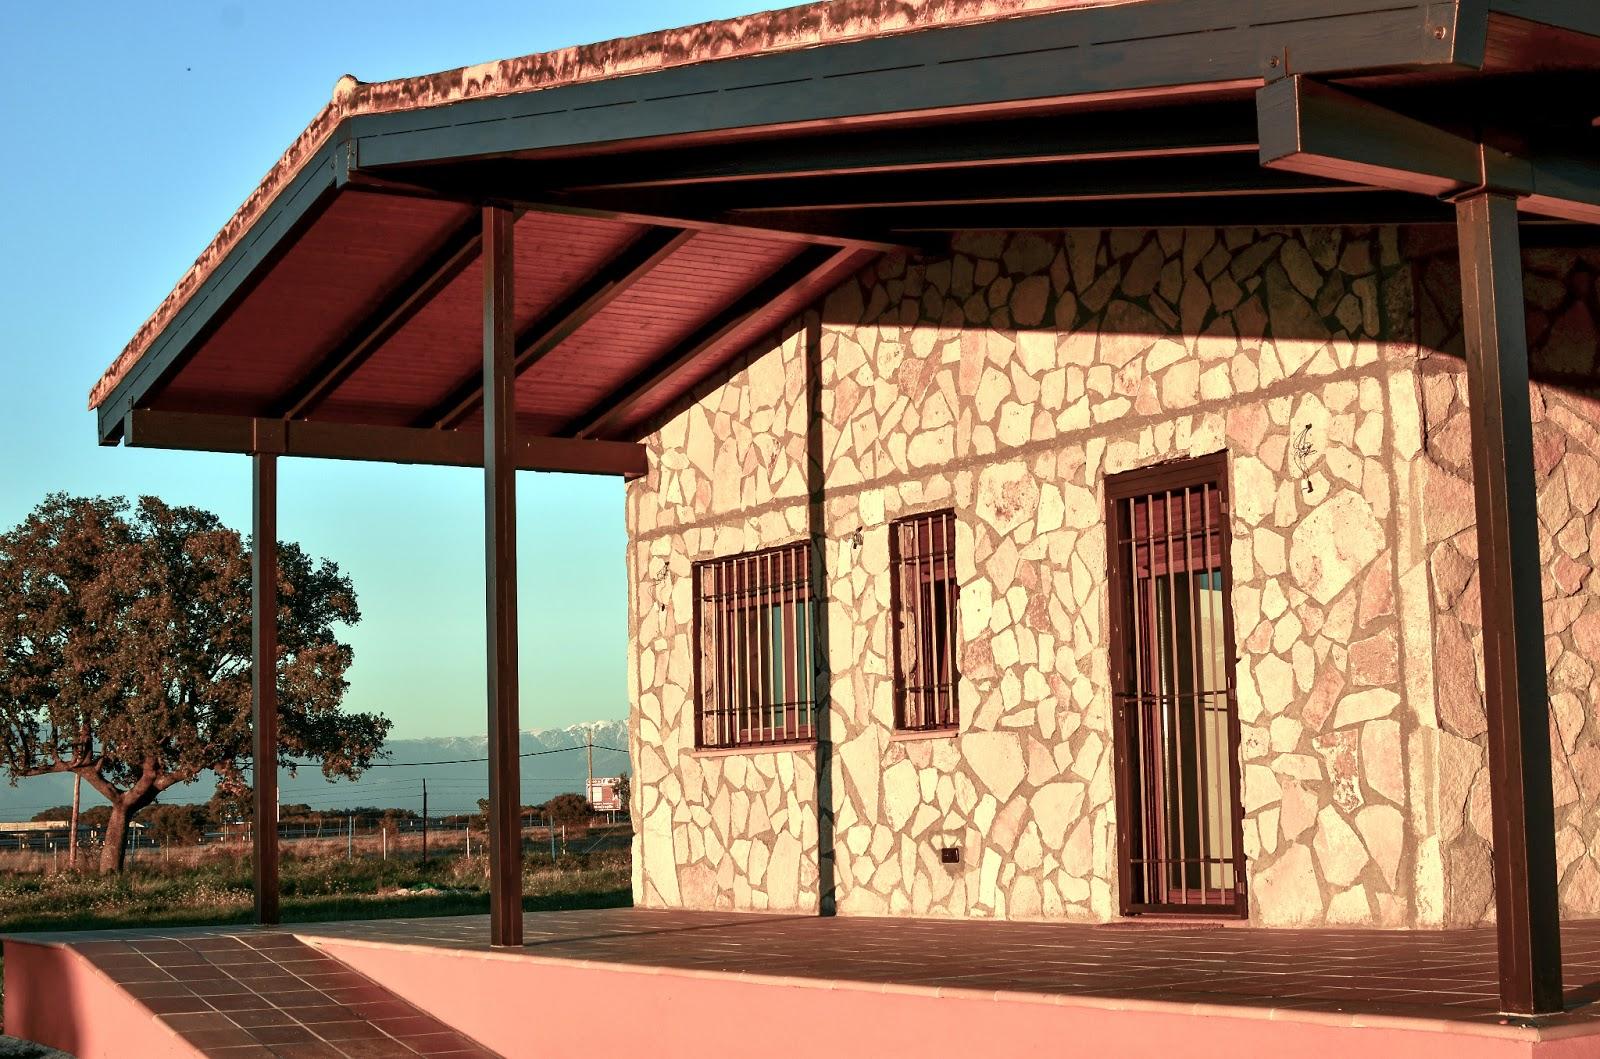 Casas prefabricadas madera casas de hormigon prefabricado precios - Precio casas prefabricadas hormigon ...